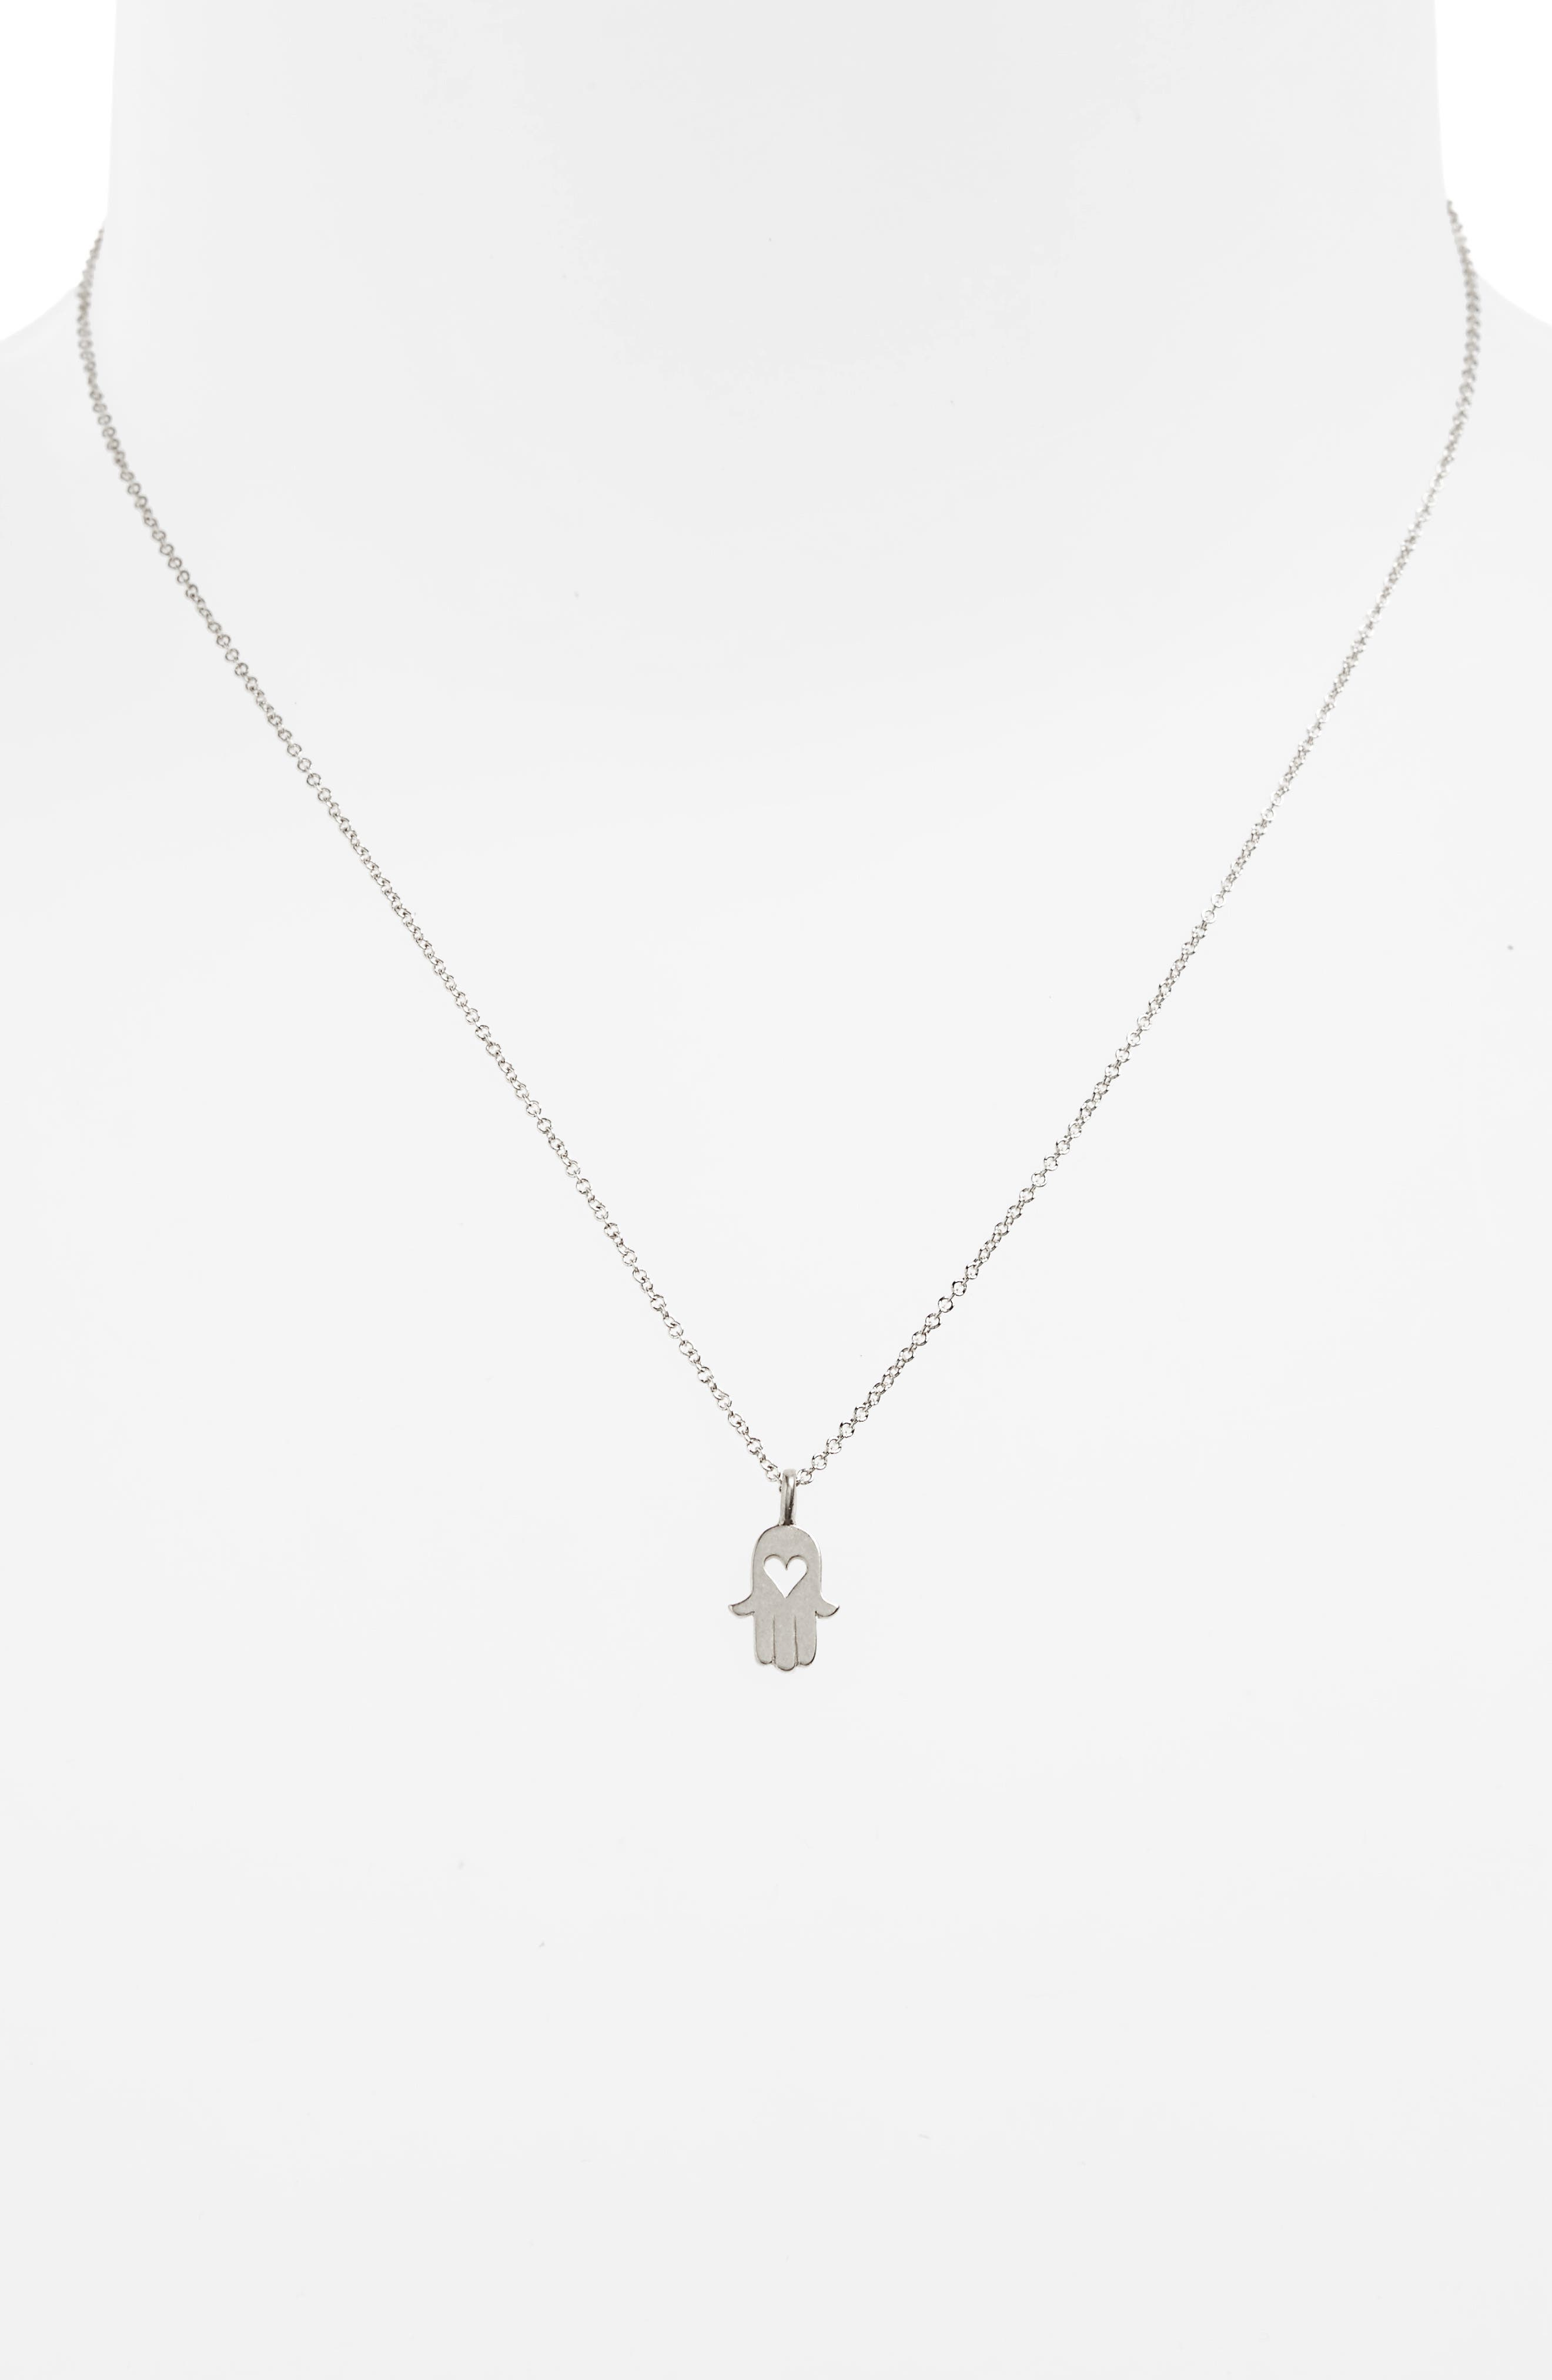 Love & Protection Pendant Necklace,                             Alternate thumbnail 3, color,                             042